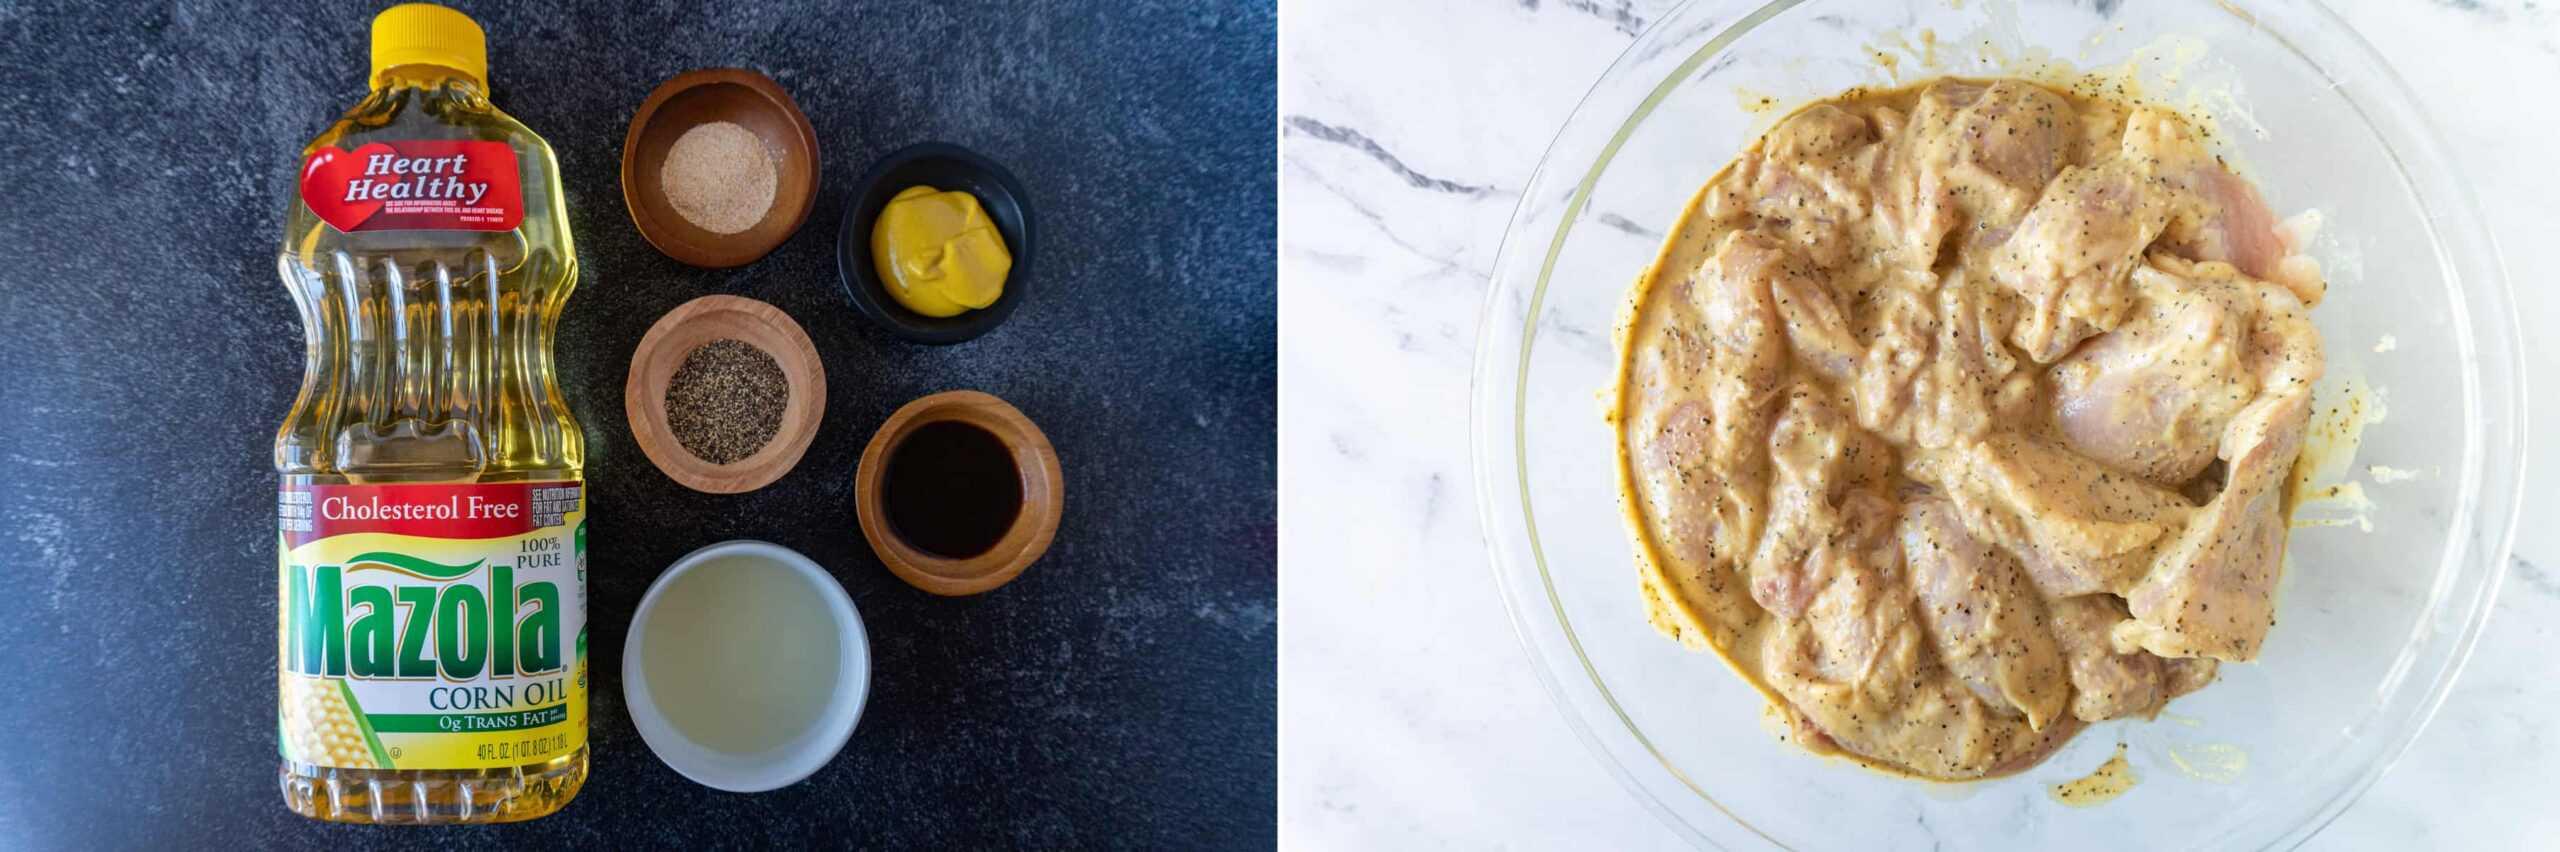 Marinade ingrediants and chicken in marinade